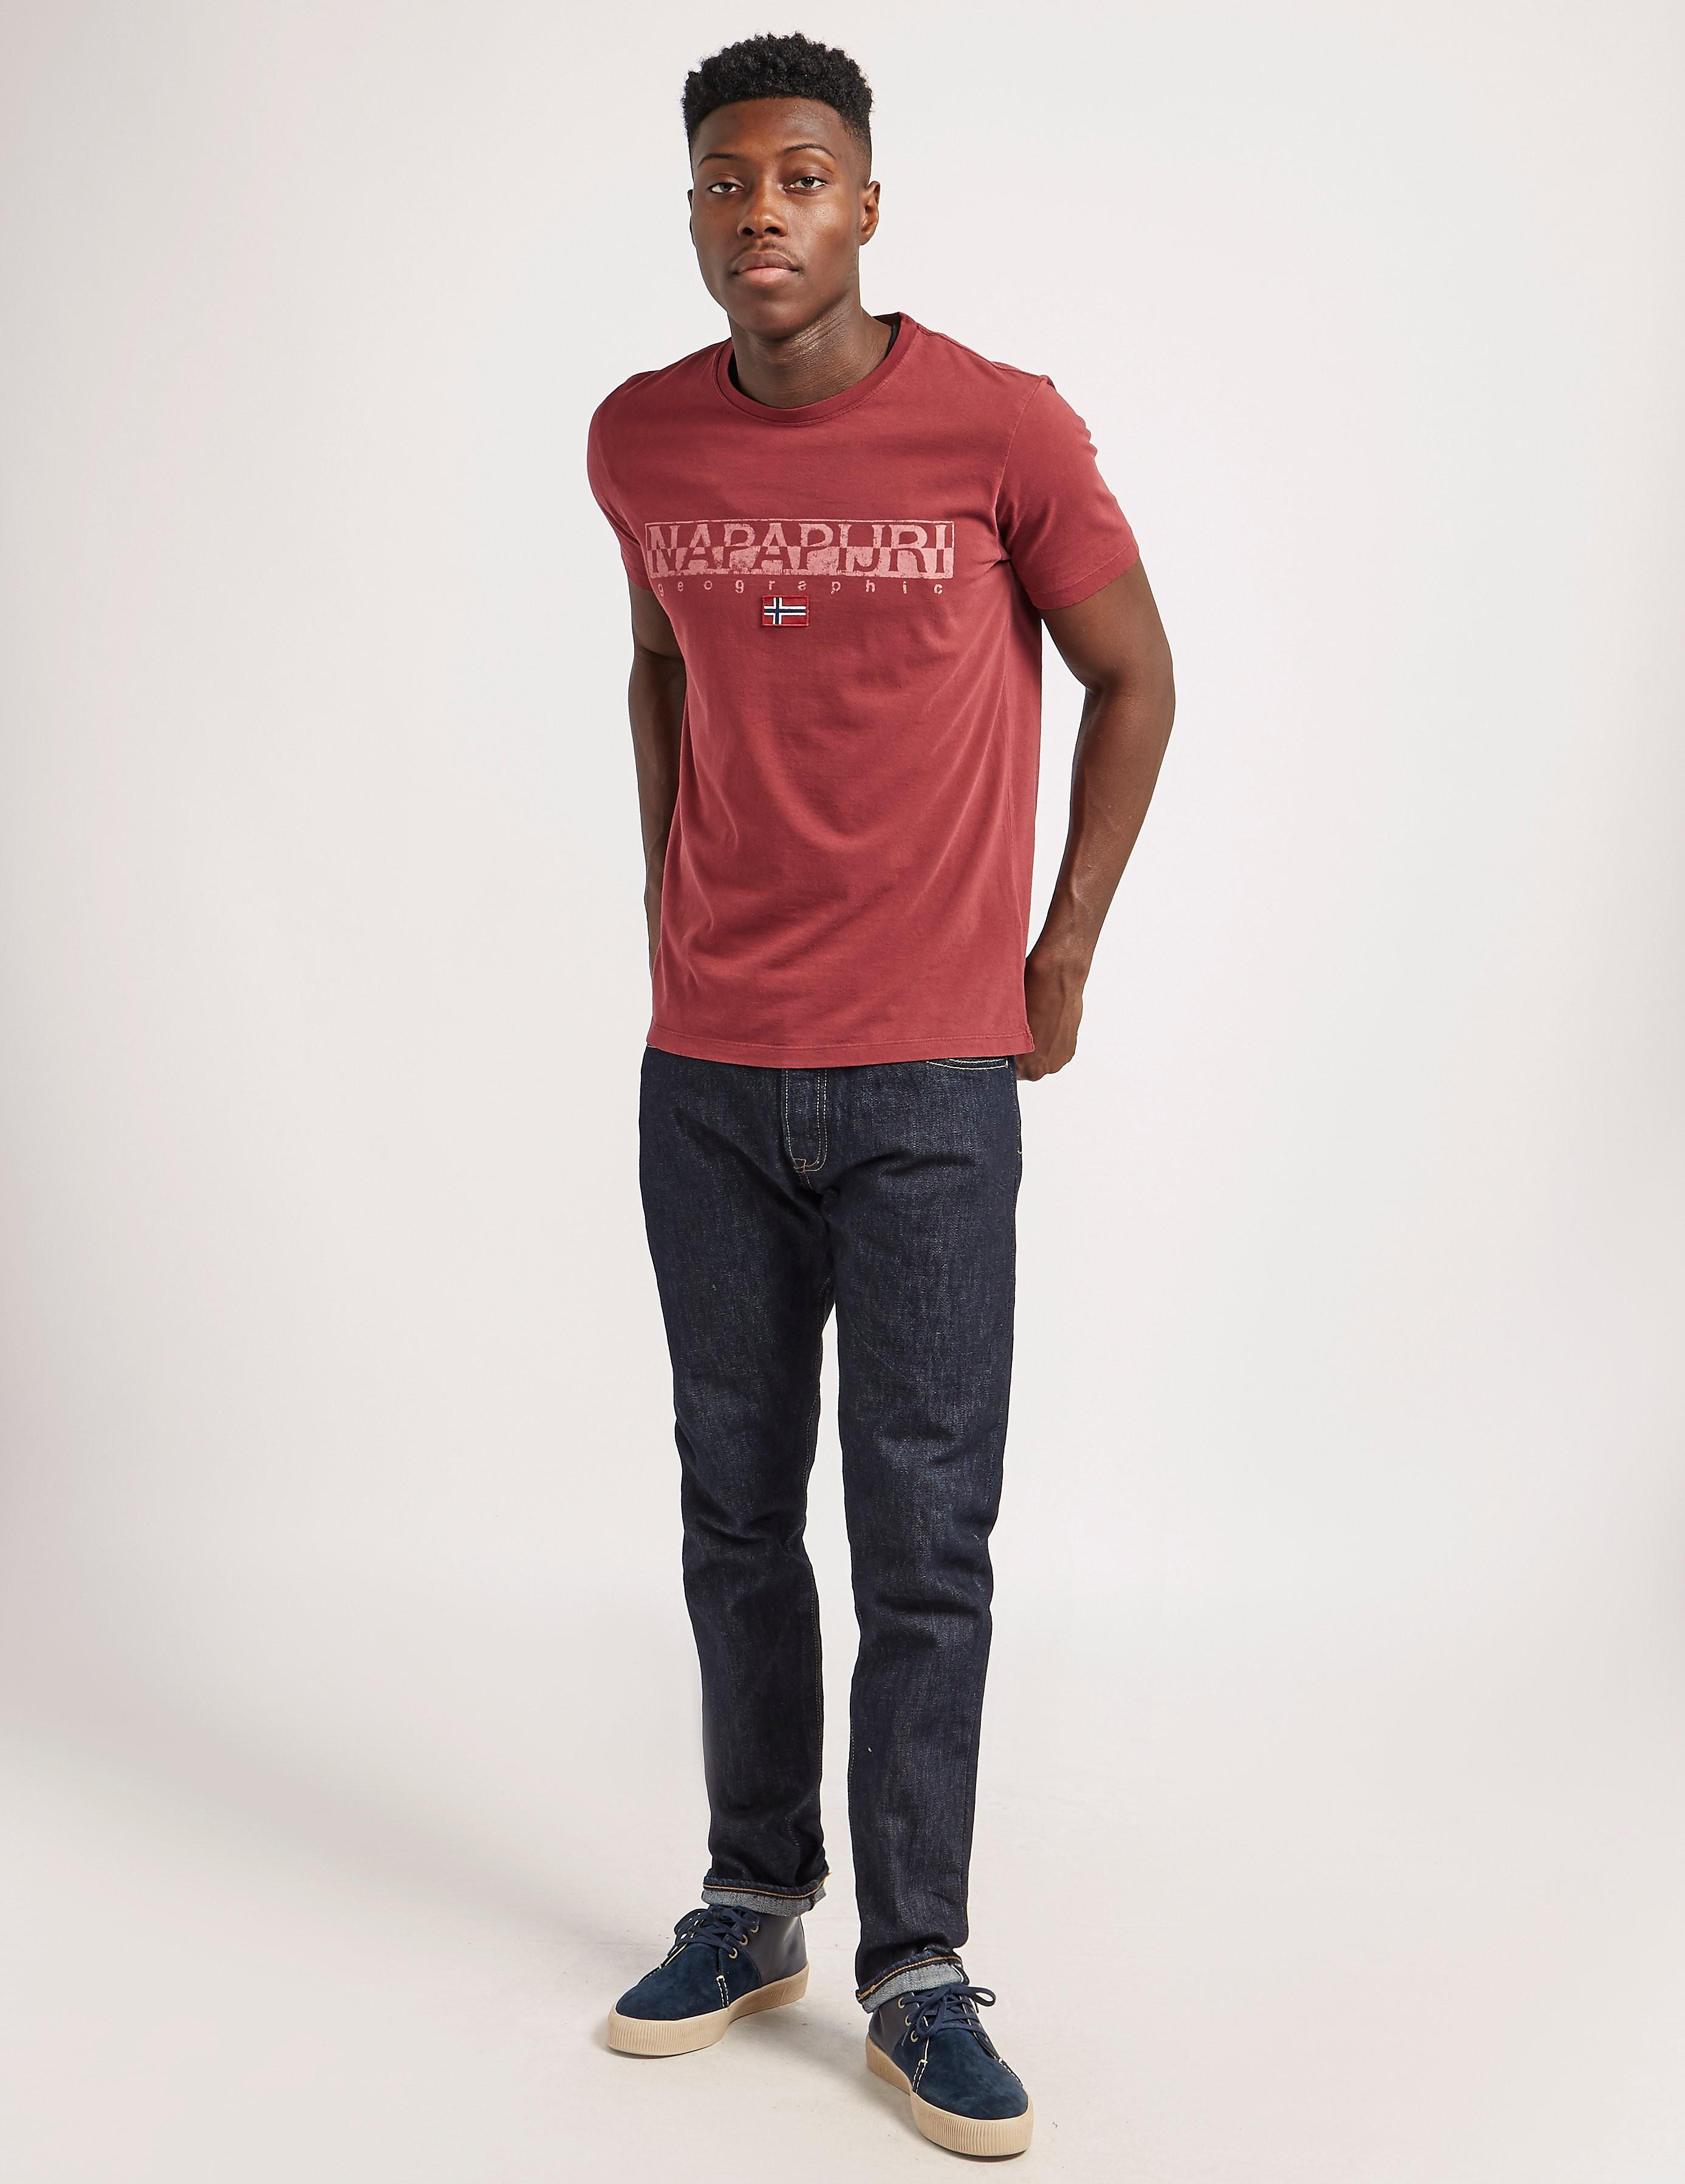 Napapijri Sapriol Short Sleeve T-Shirt